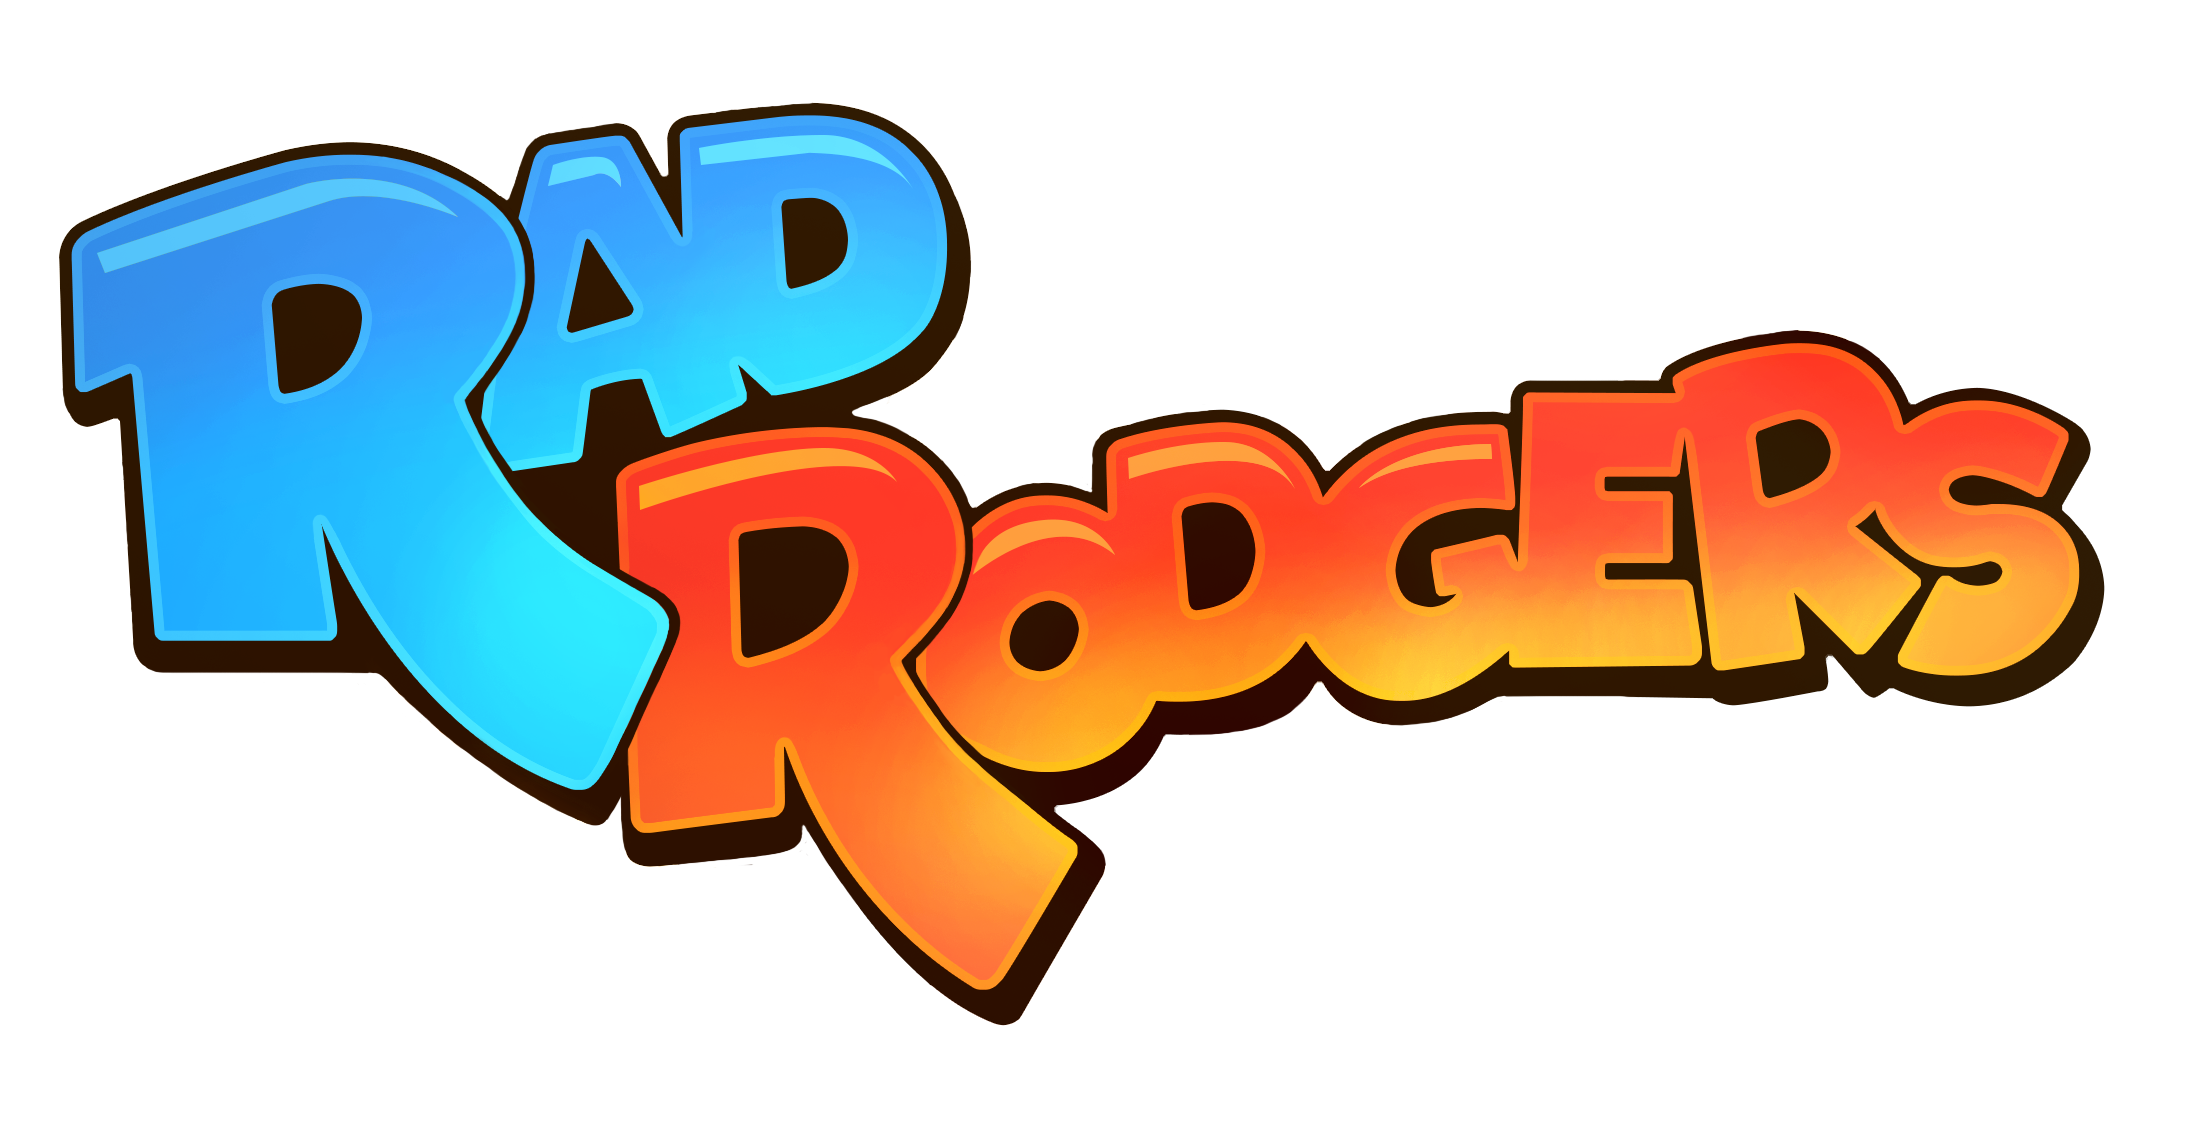 Rad-Rogers_2018_01-12-18_011